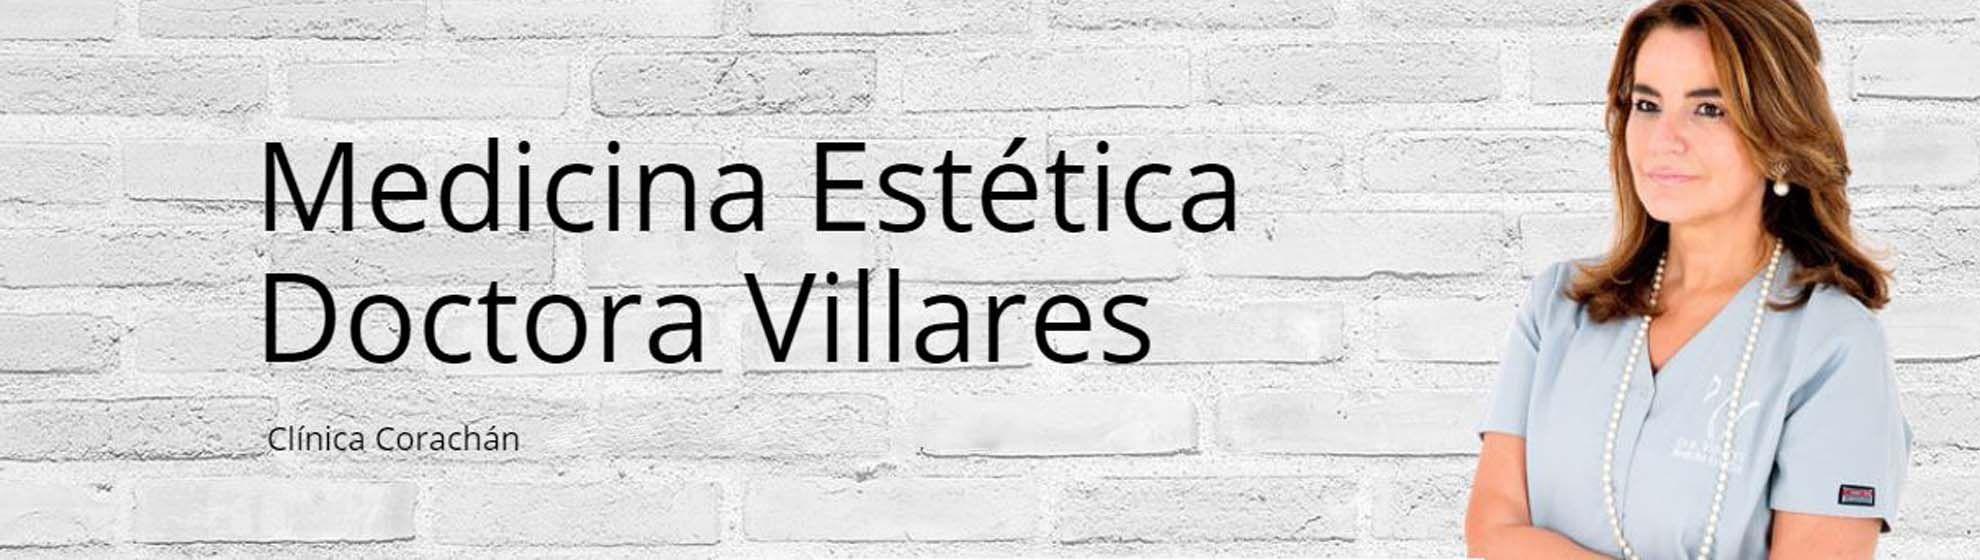 Doctora Villares